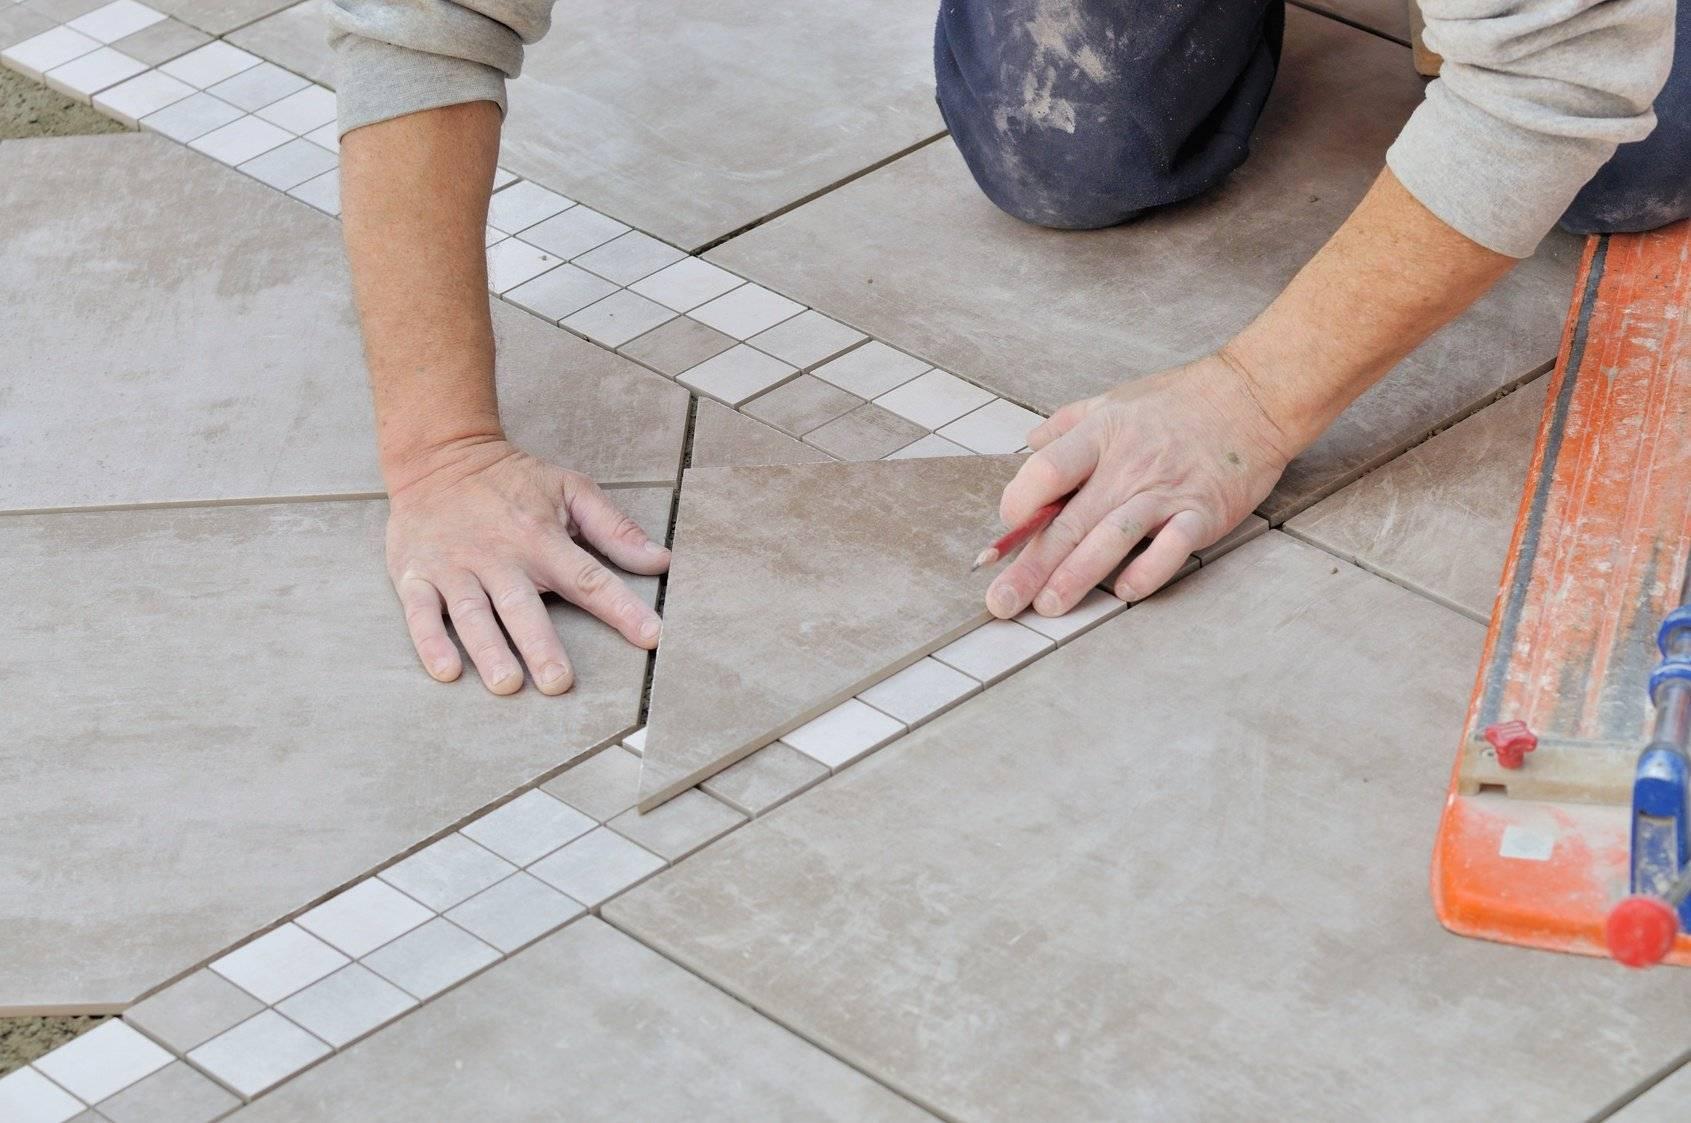 Укладка плитки на пол: тонкости процесса